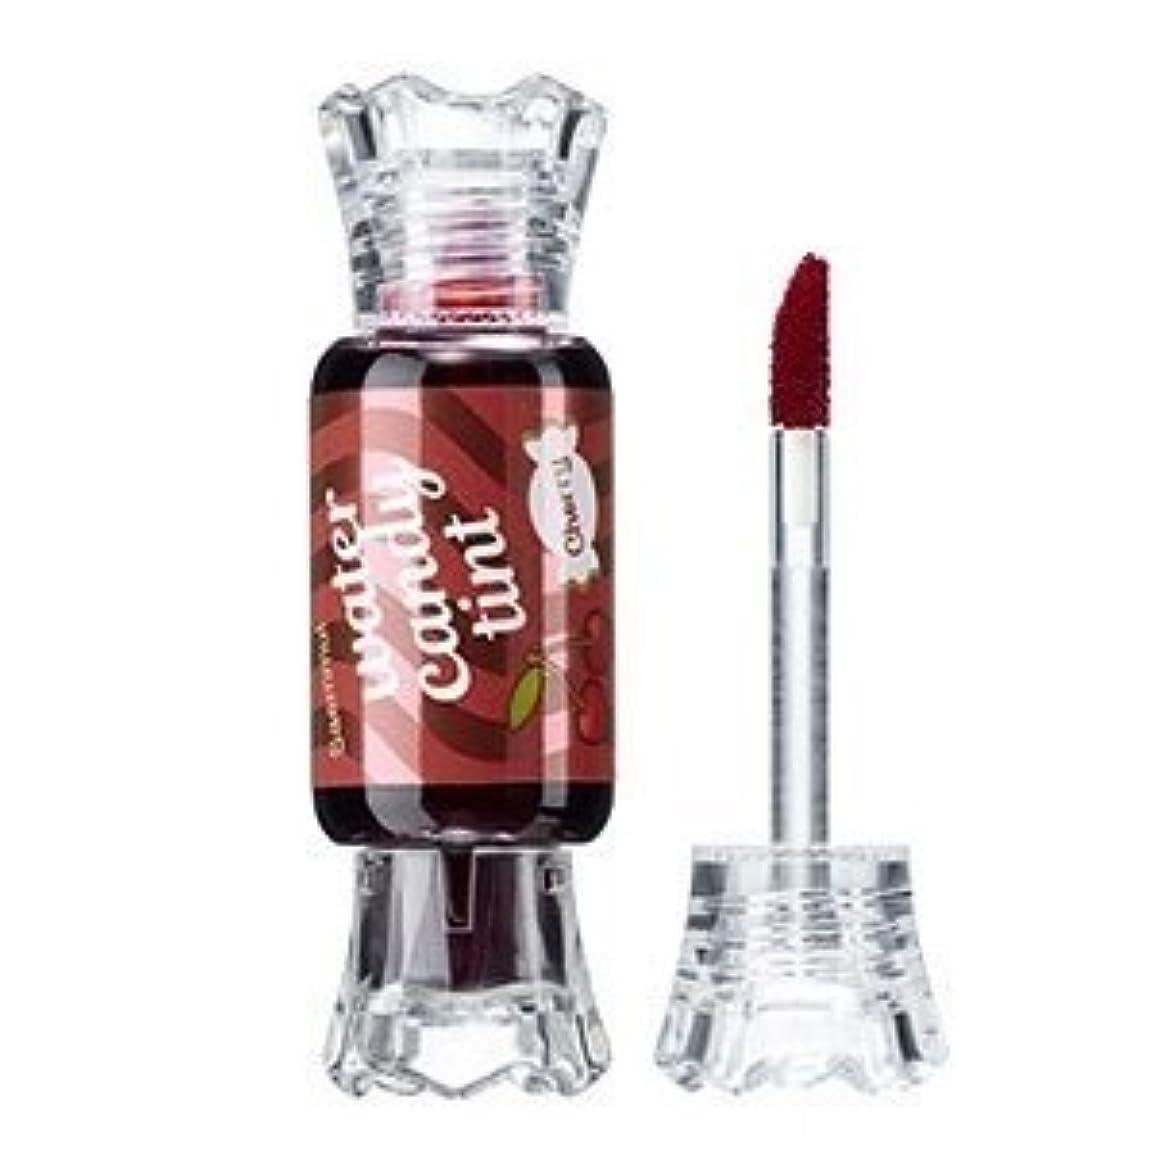 The Saem Saemmul Water Candy Tint #01.Cherry ザセム セムムルウォーターキャンディティント# 01チェリー [並行輸入品]